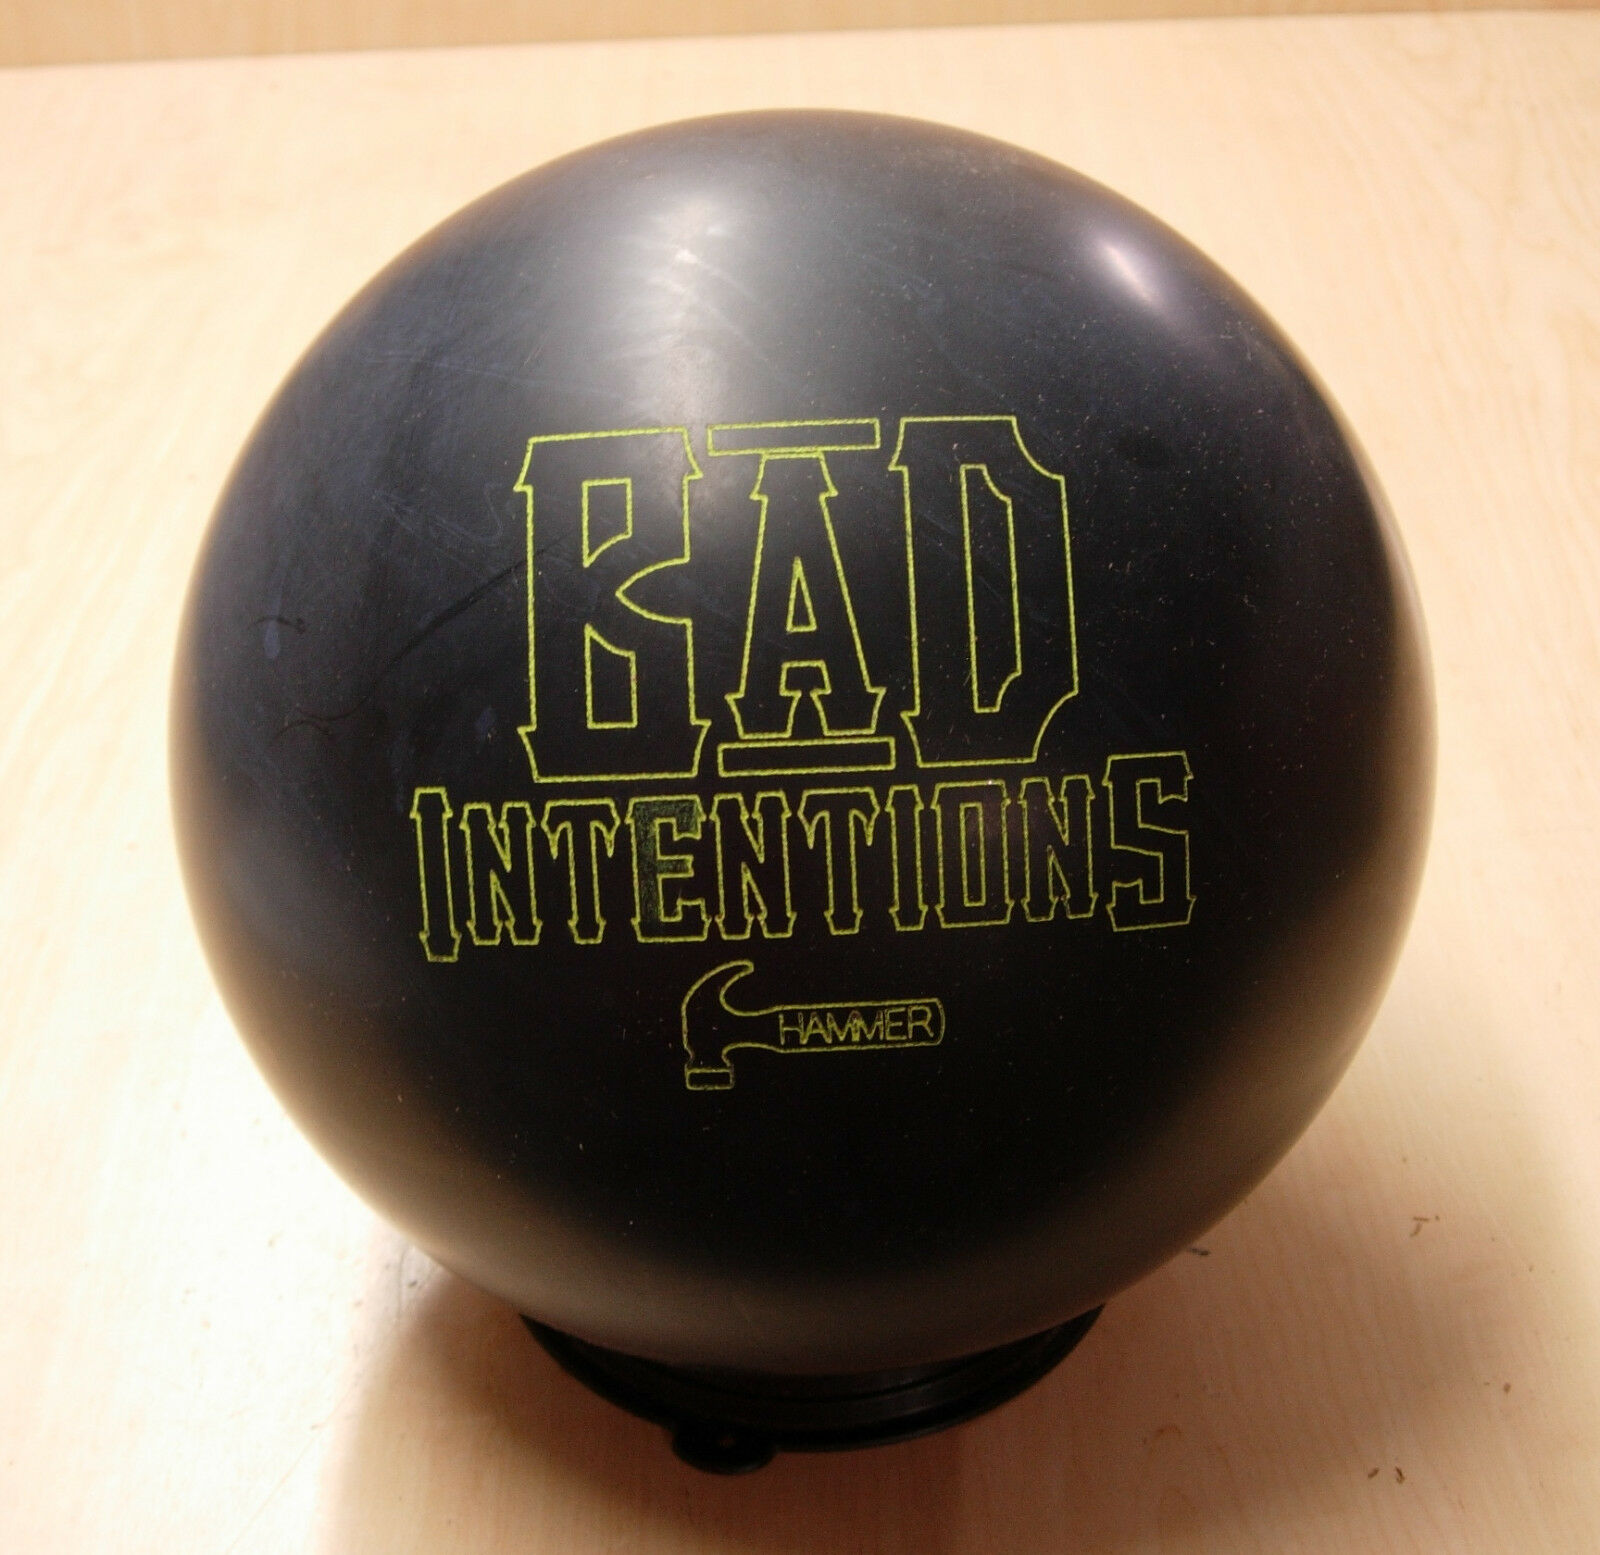 = 15oz TW 2-3 4, Pin 2-3 NIB Hammer BAD INTENTIONS Bowling Ball